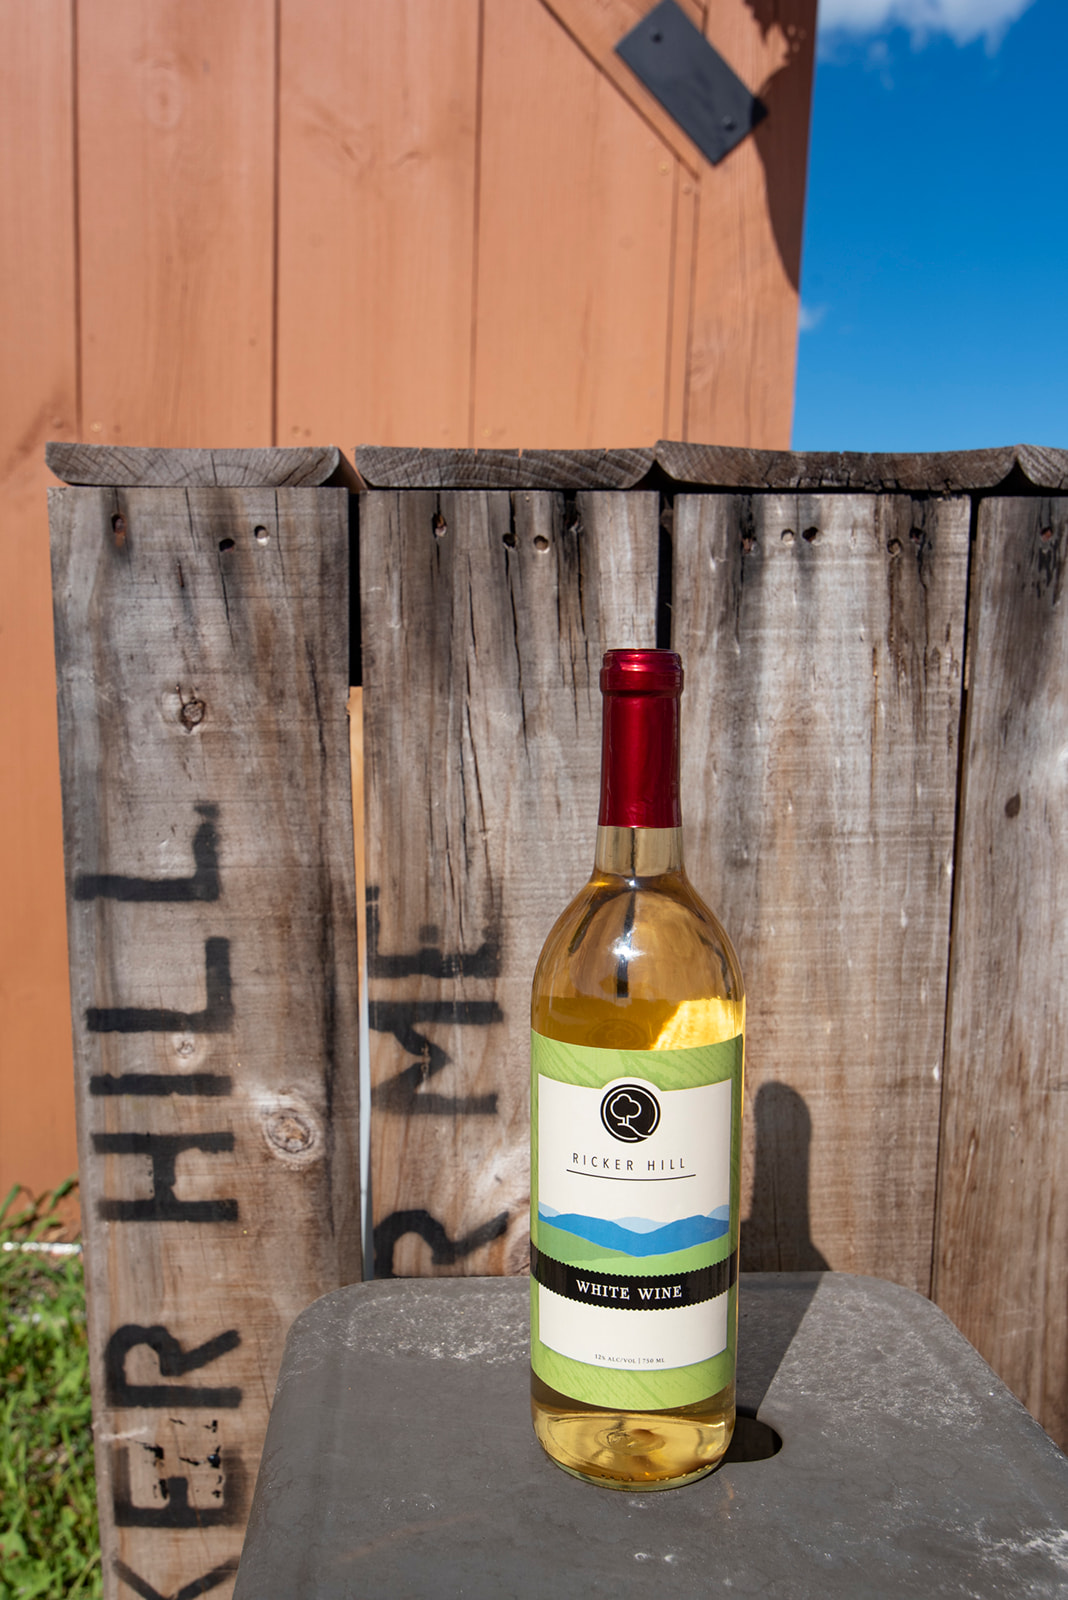 Ricker Hill White wine